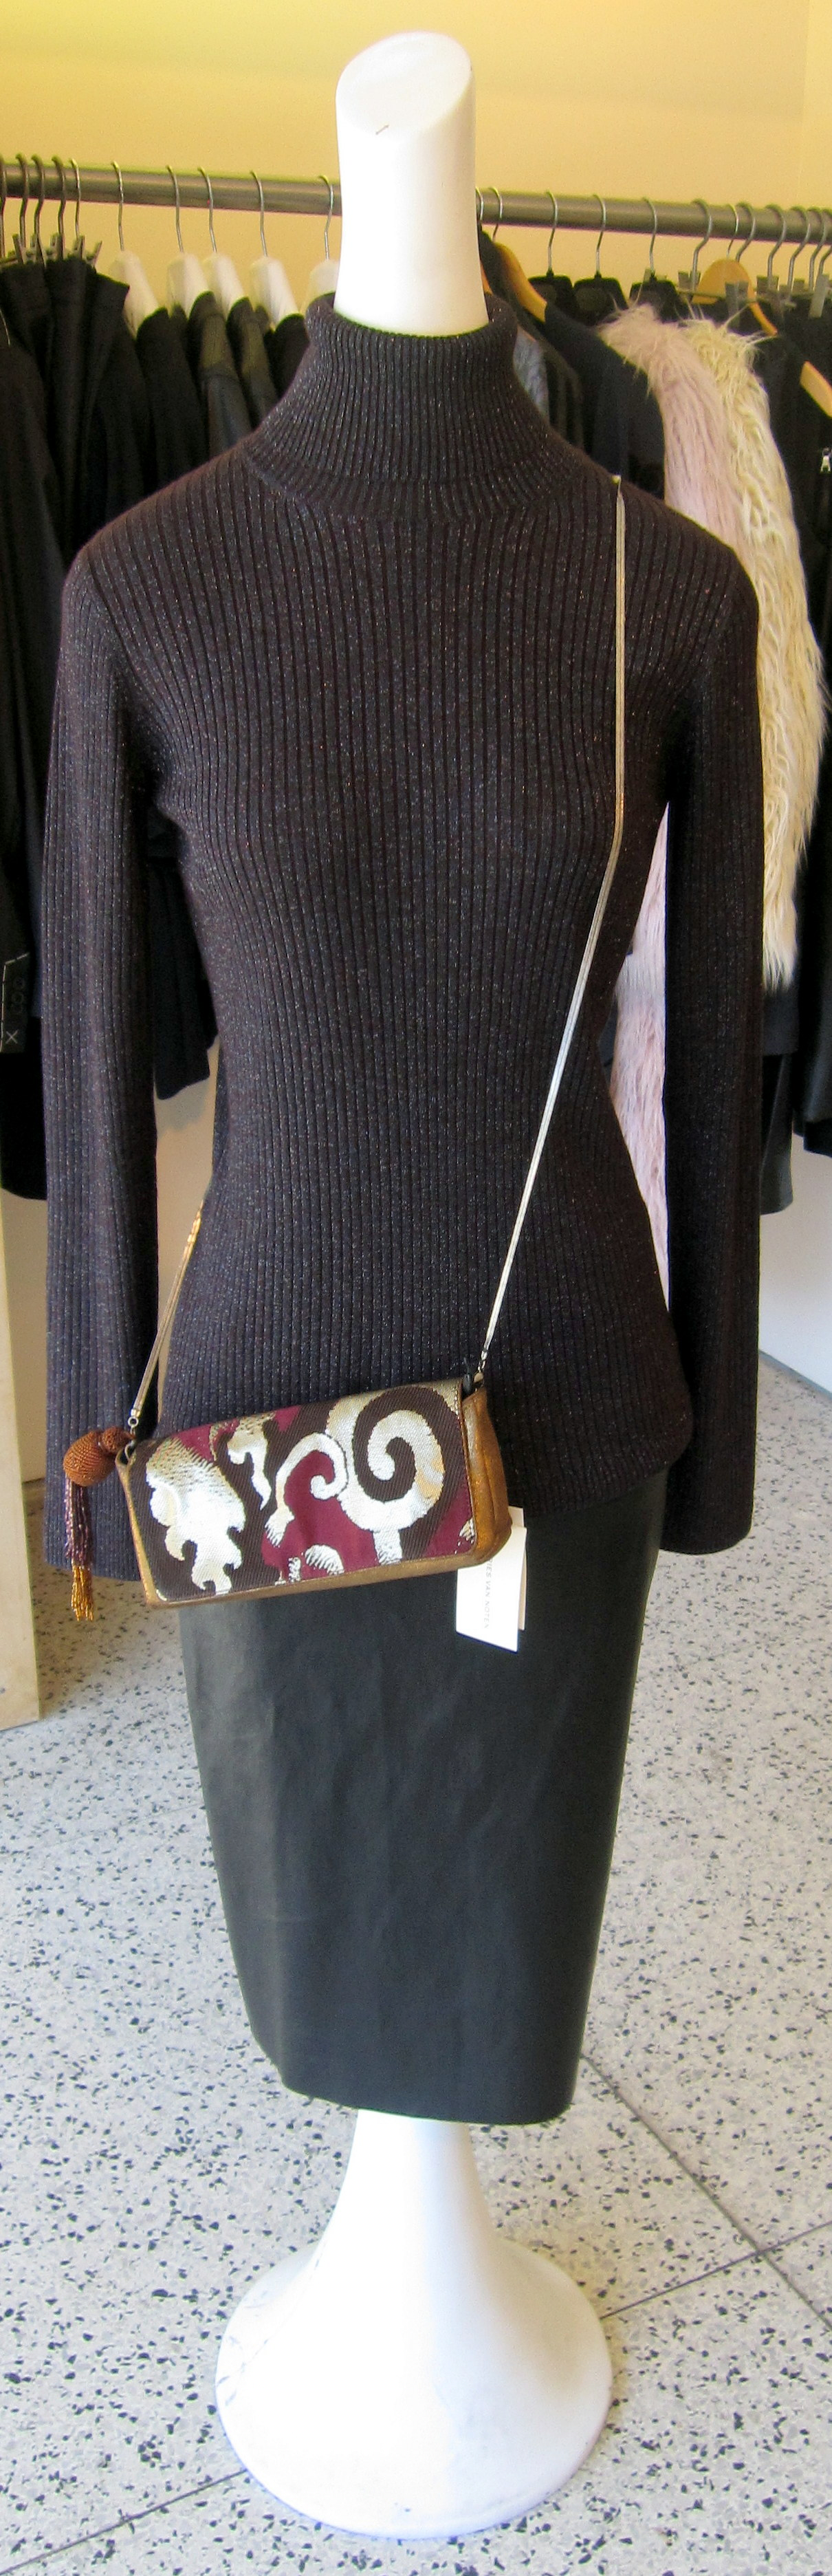 Dries Van Noten shirt/handbag Stoules leather skirt